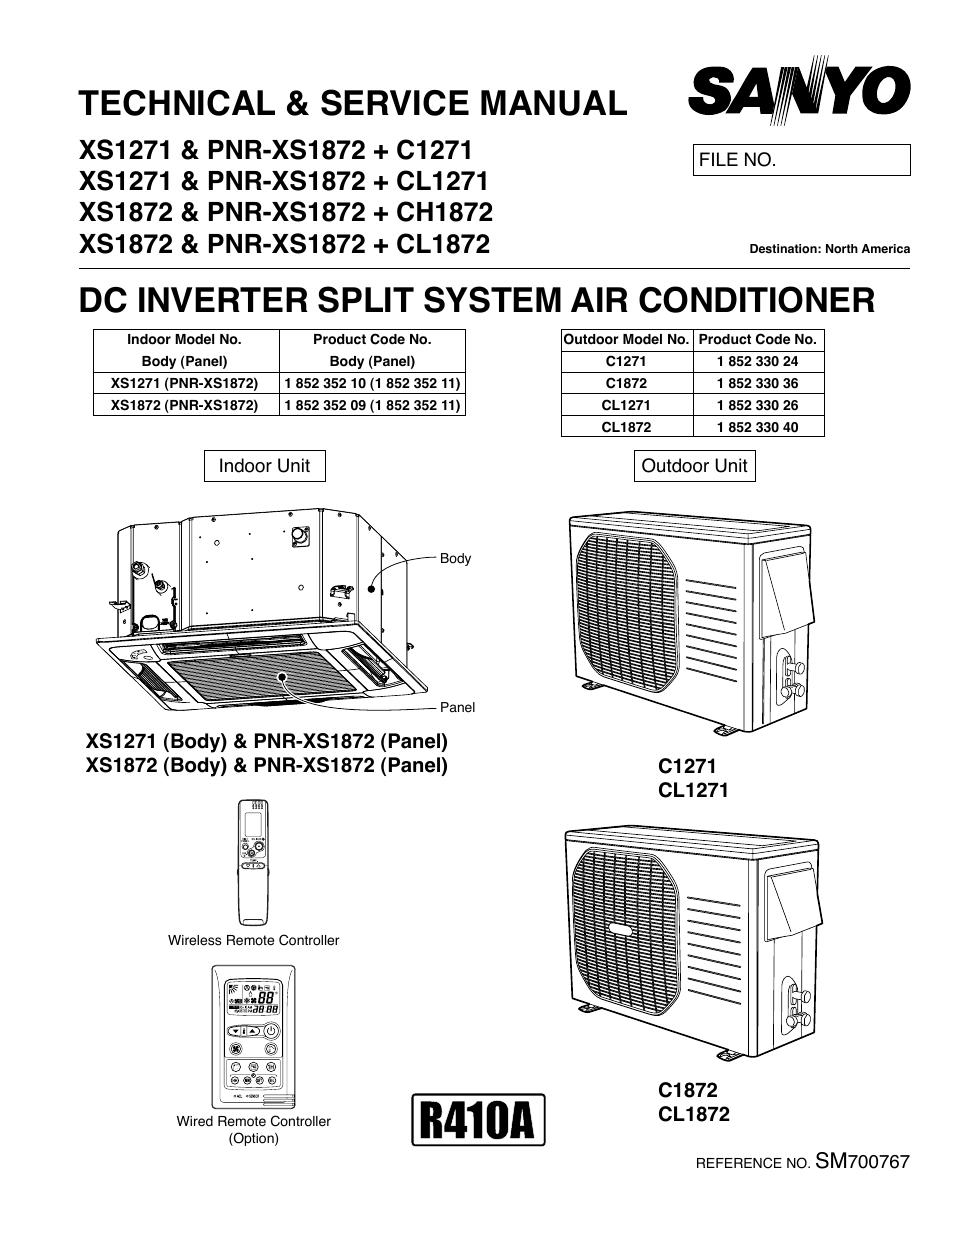 sanyo dc inverter split system air conditioner c1271 user Split Air Conditioner sanyo room air conditioner owner's manual